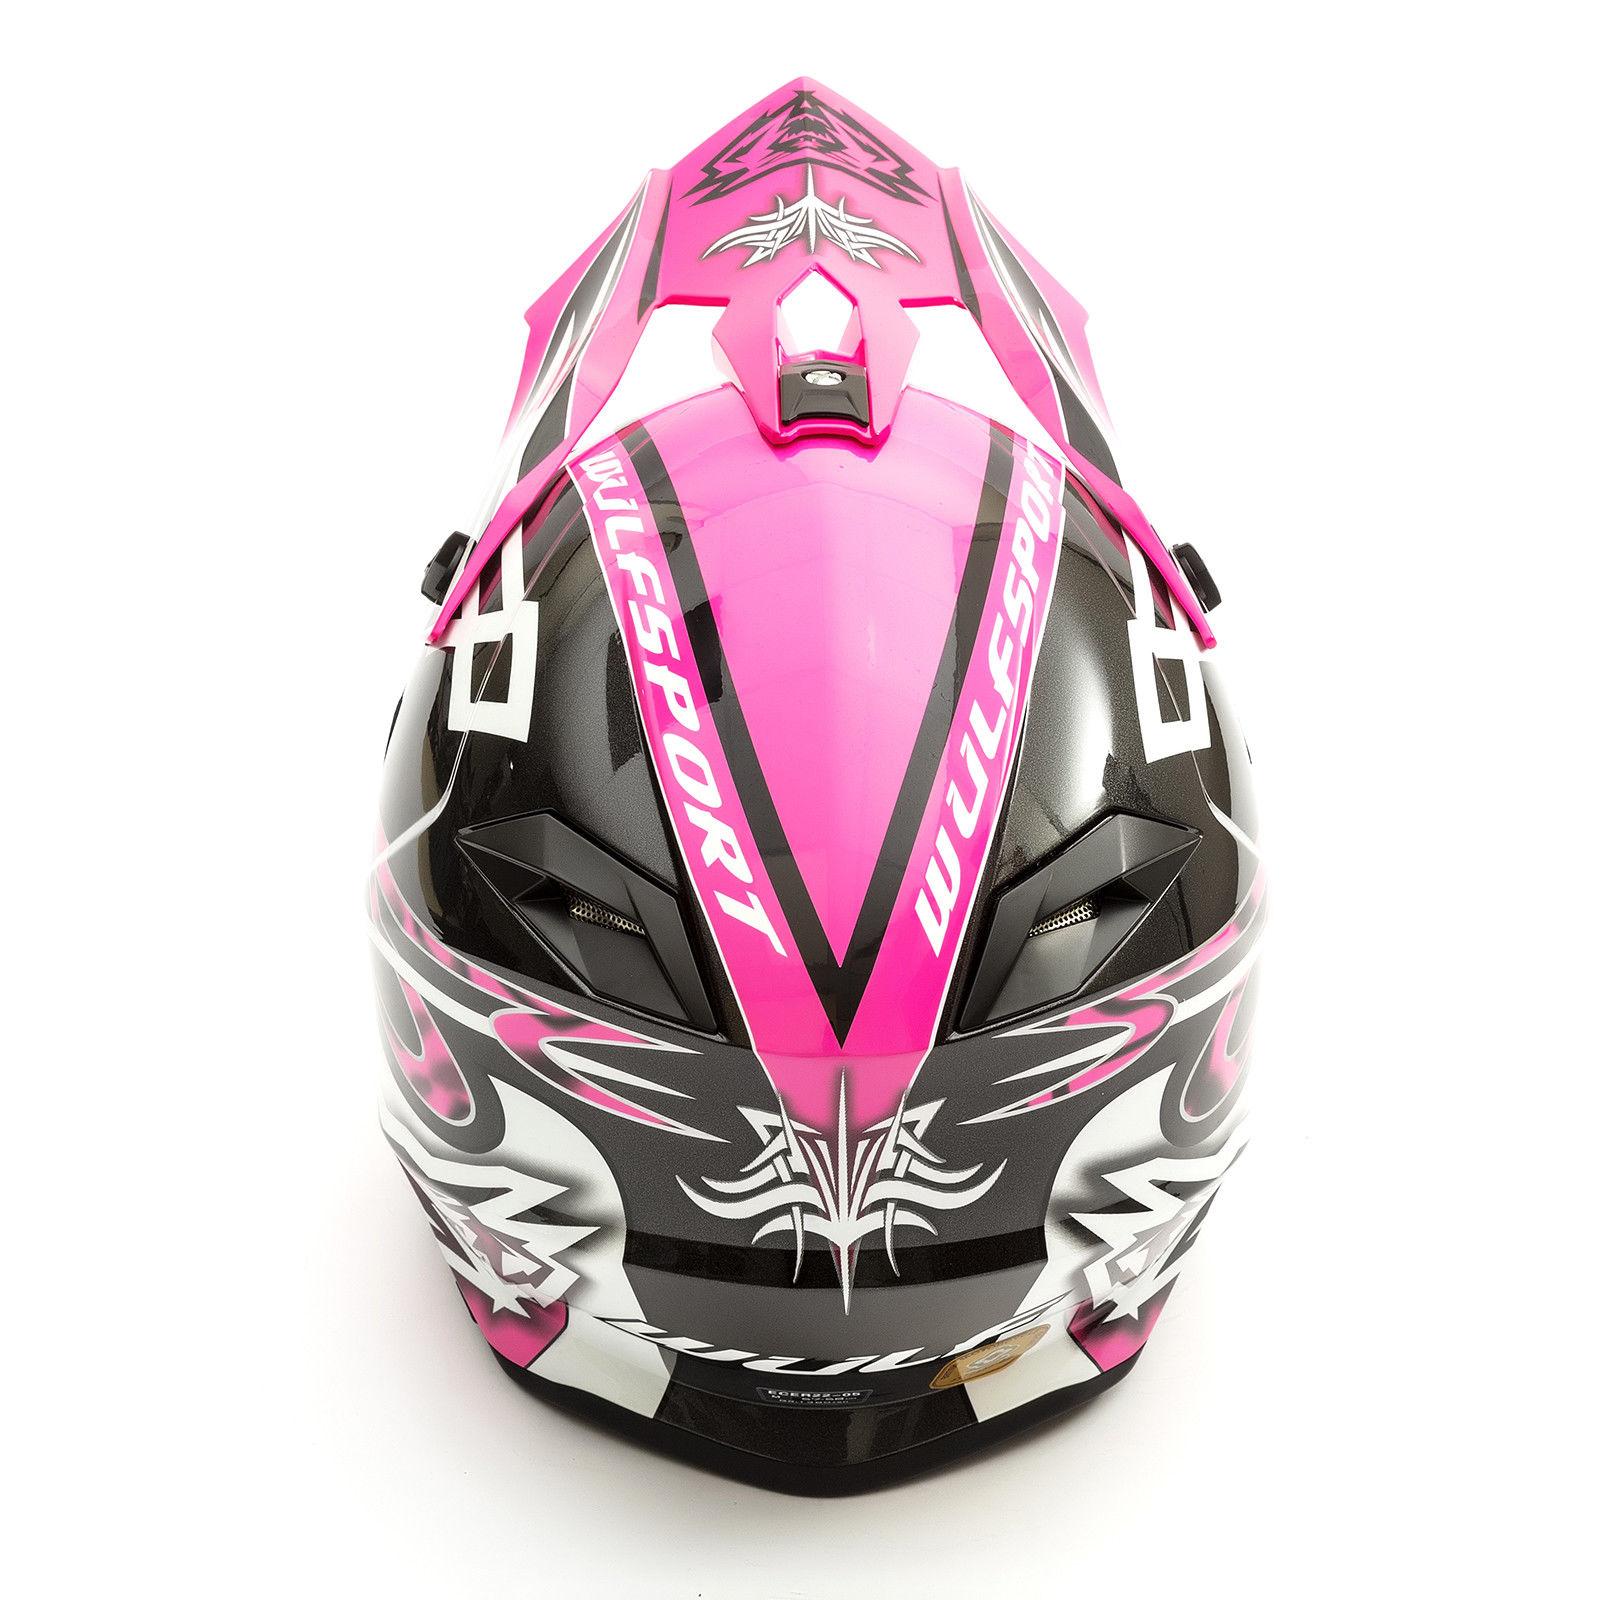 Wulfsport-Adult-Sceptre-Helmets-Motocross-Pitbike-Motorbike-Off-Road-Racing-ATV thumbnail 42